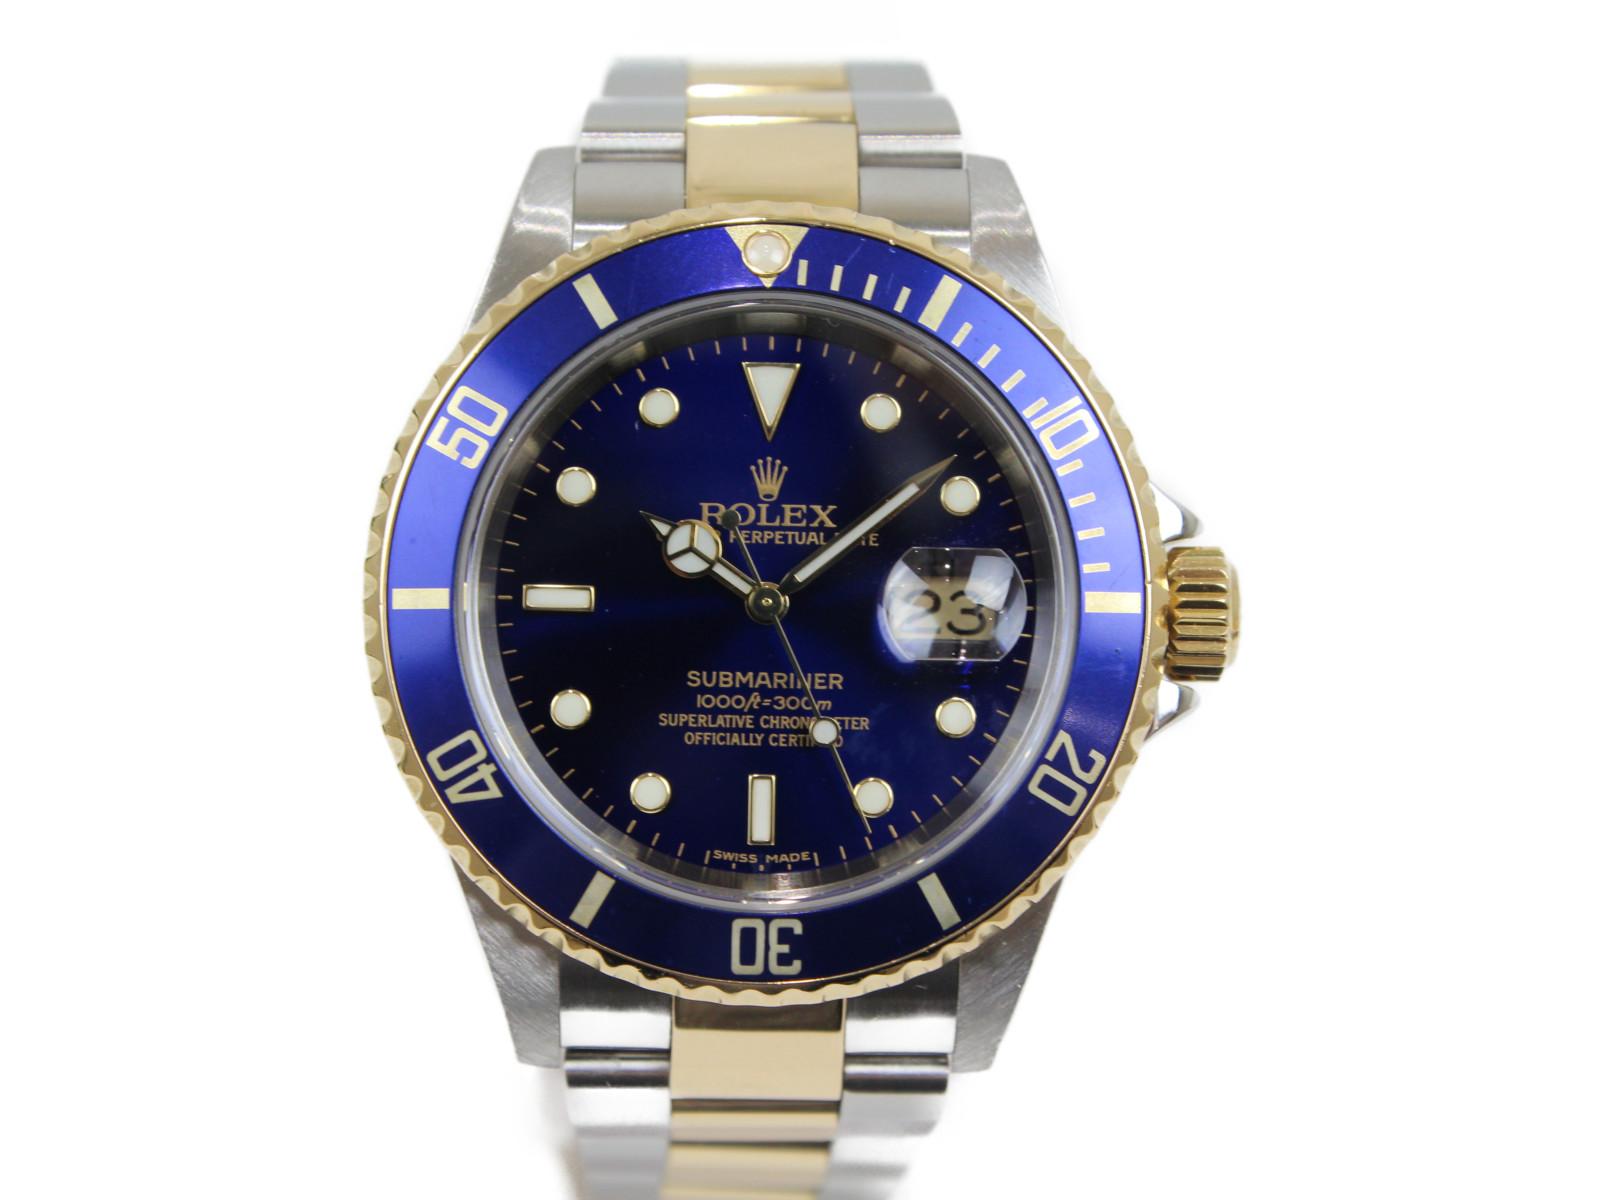 ROLEX ロレックス サブマリーナーデイト 16613 Z番 自動巻き 青サブ K18 イエローゴールド SS ステンレススチール コンビ メンズ 腕時計【中古】